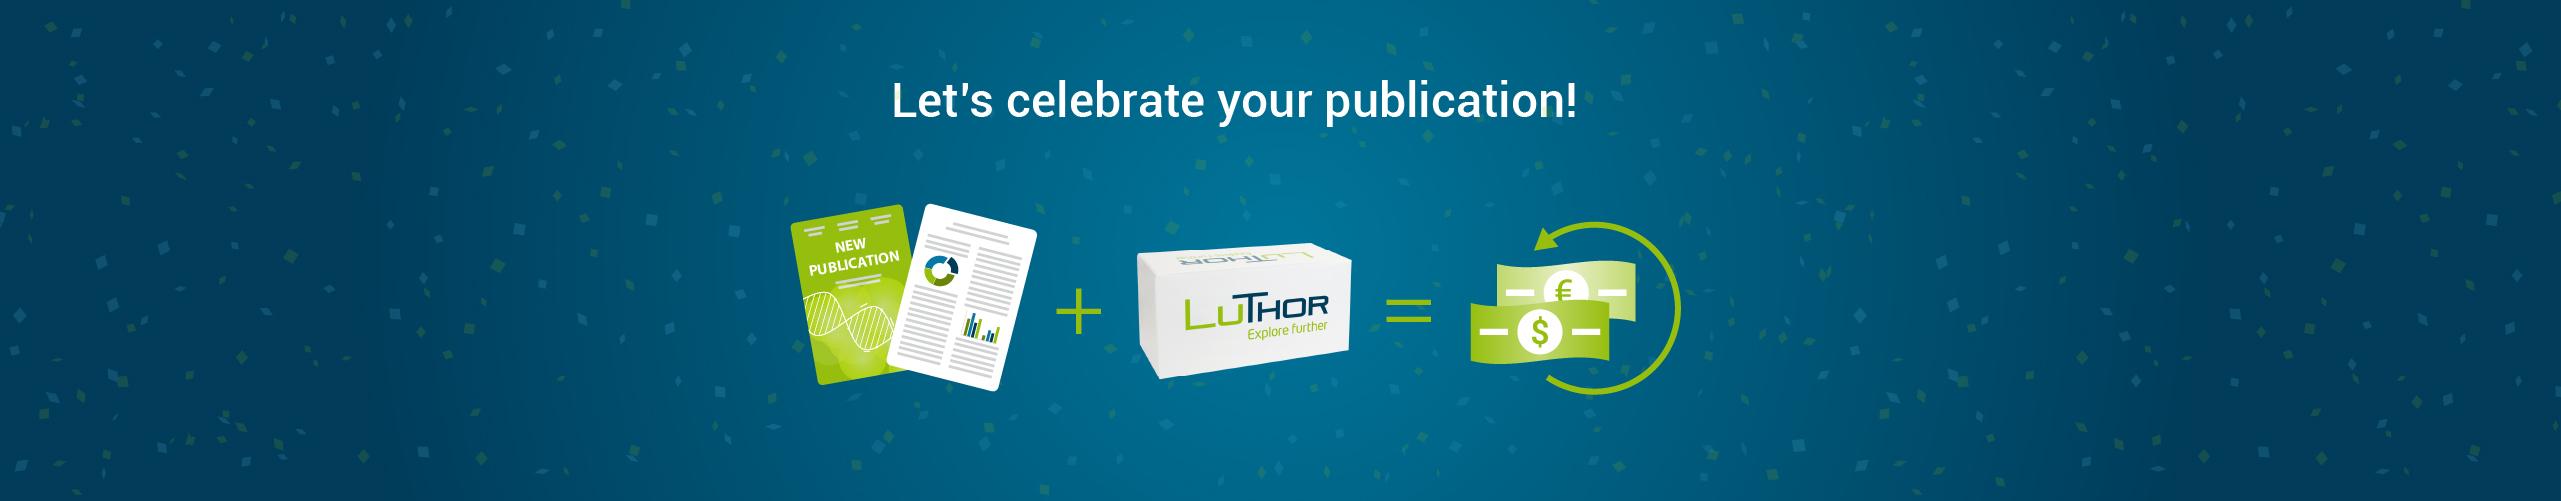 LUTHOR Publications Campaign_Website banner